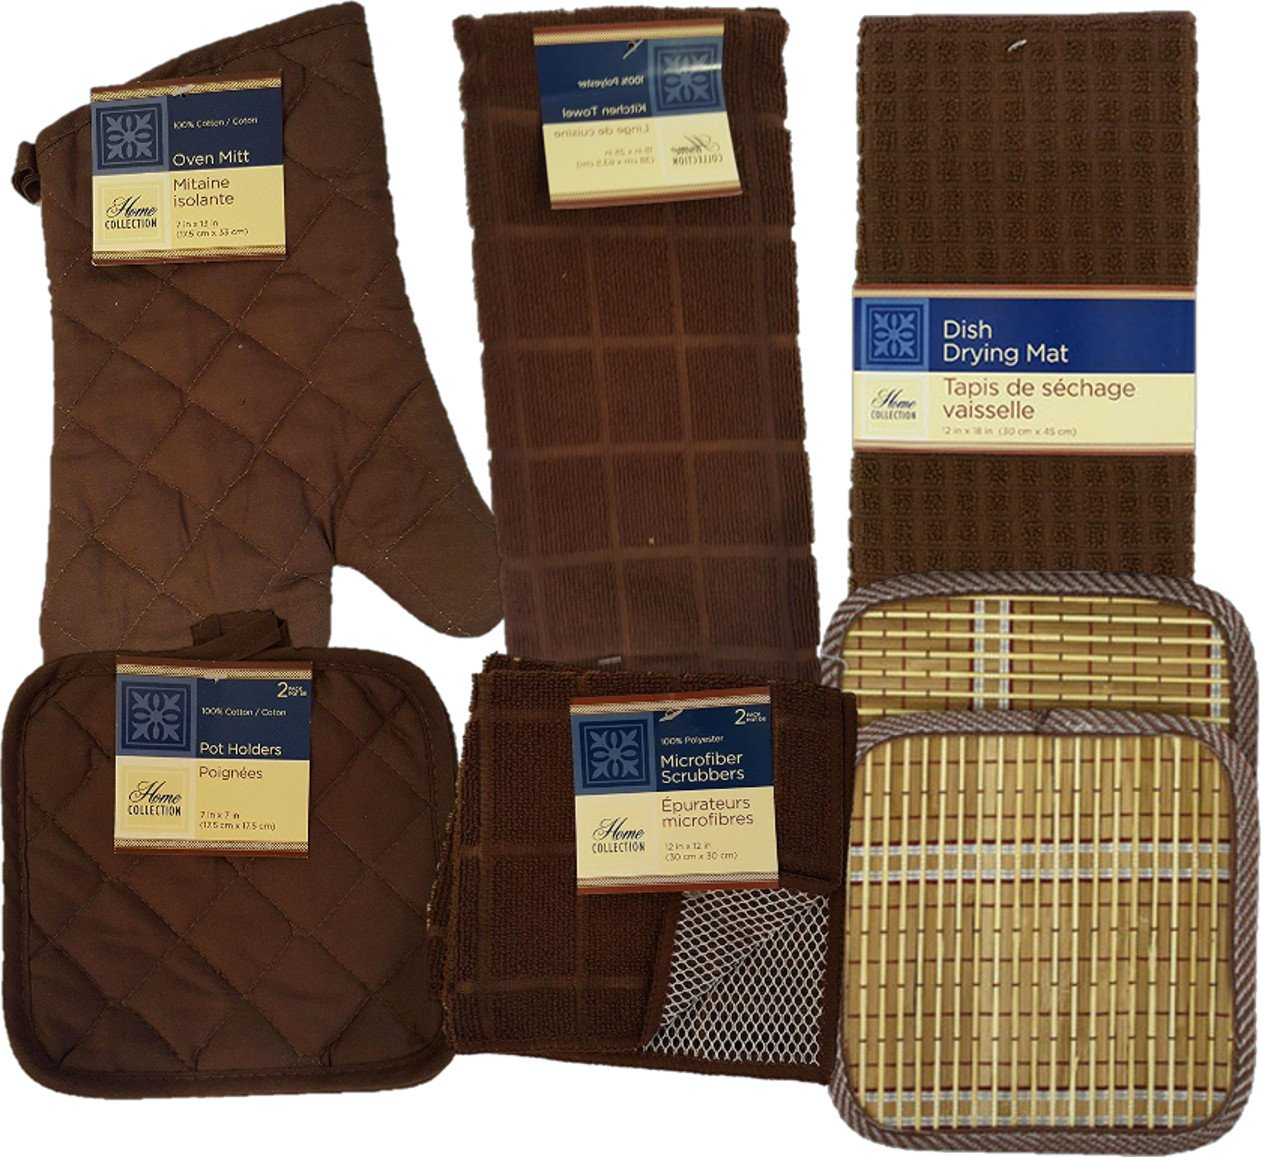 Kitchen Linens Bundle of 8 Items - Matching Kitchen Towel, Oven Mitt, Pot Holders,Dish Cloths, Dish Drying Mat and Bonus Bamboo Hot Pads (Brown)